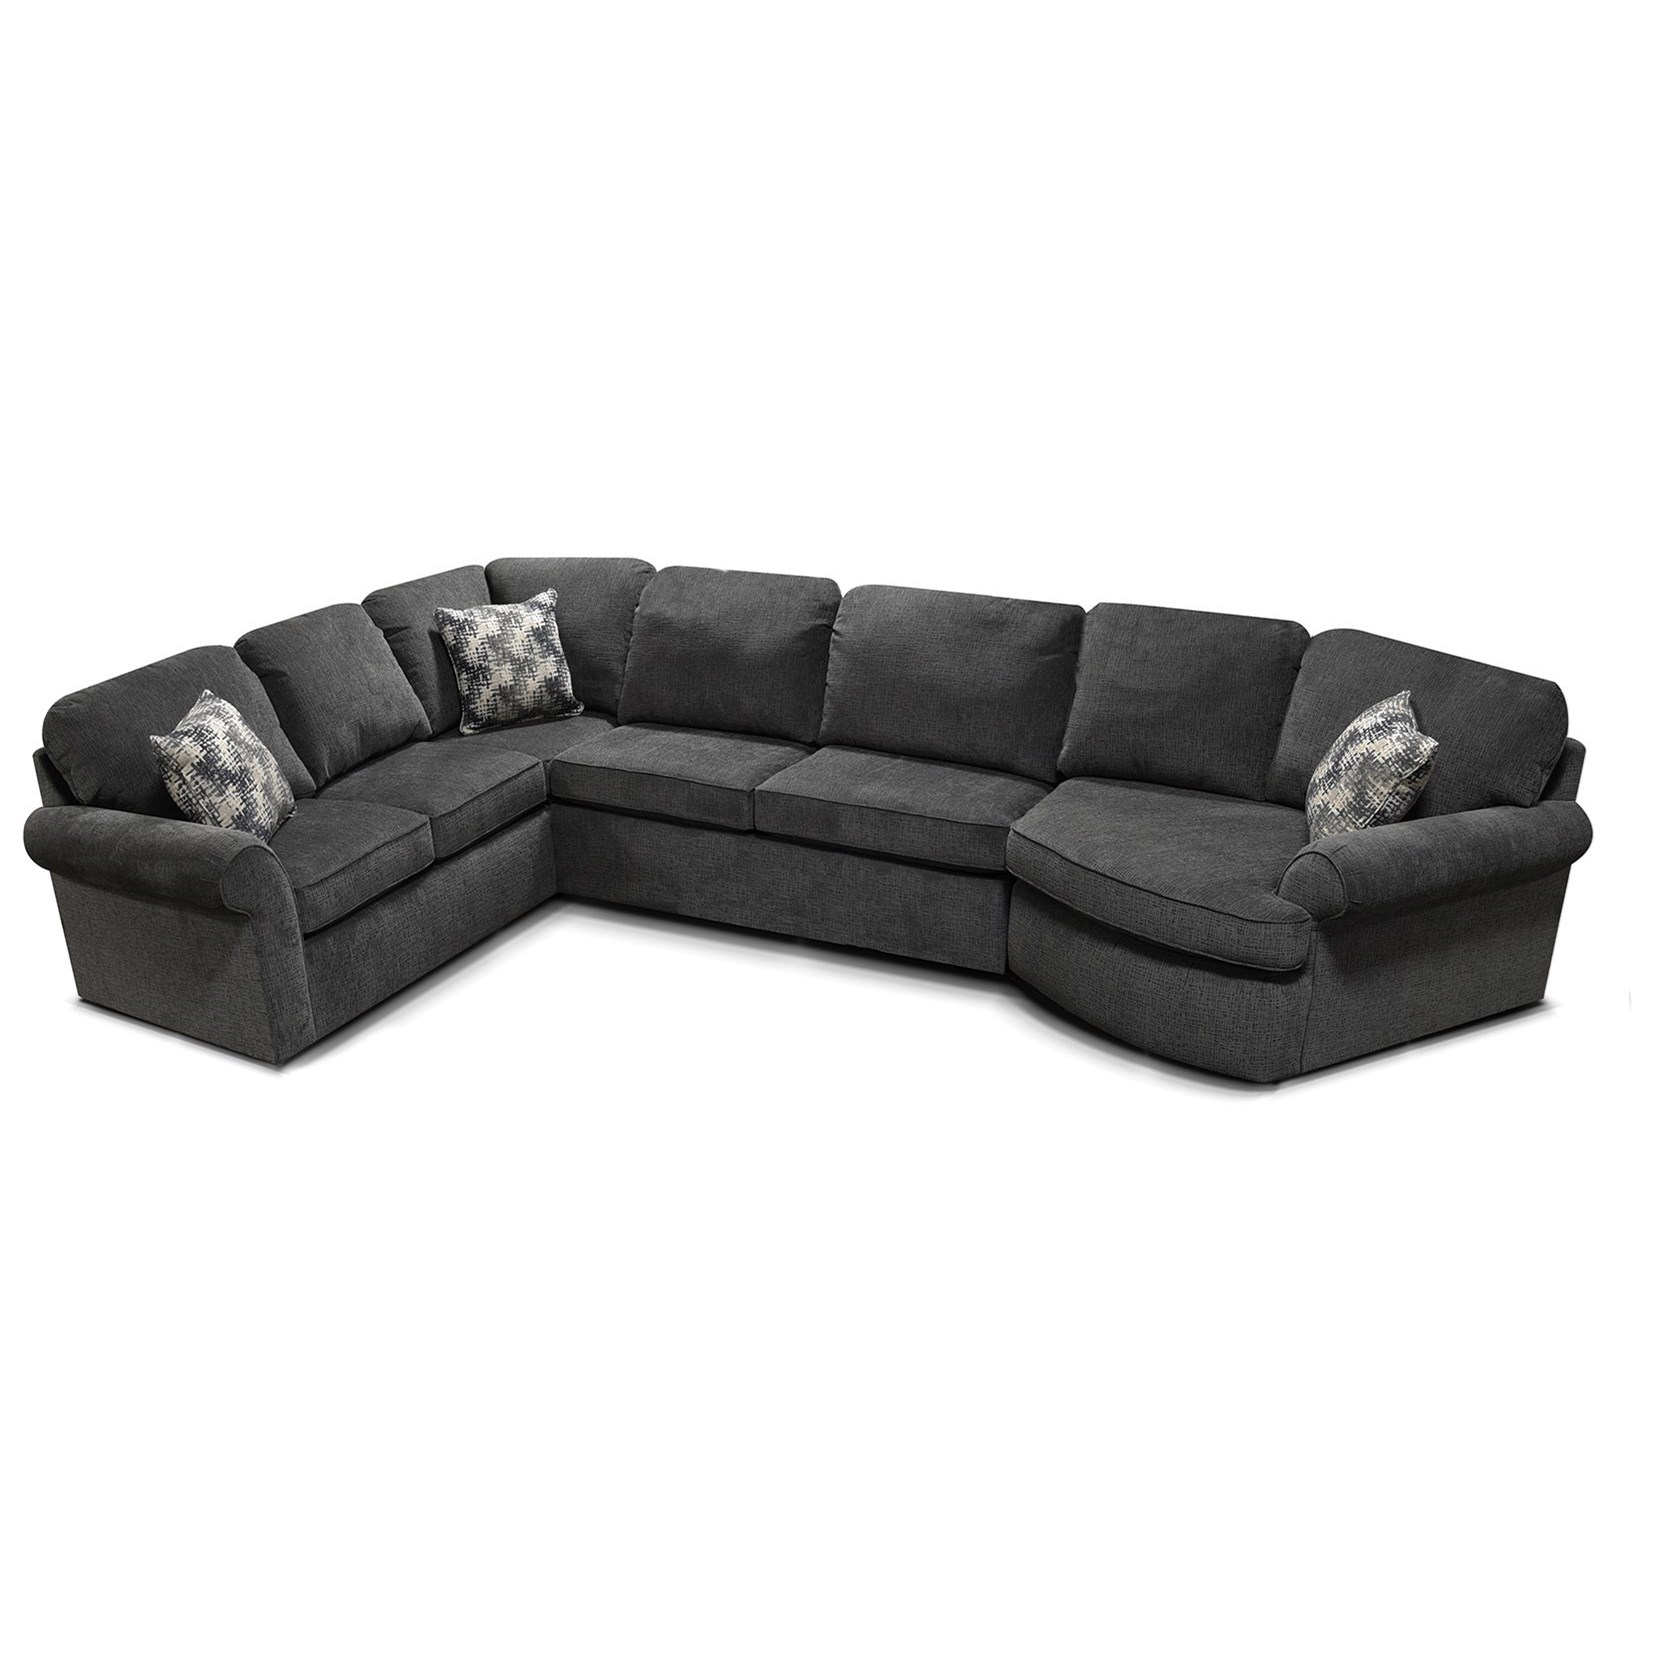 England Malibu Casual 3-Piece Sectional | A1 Furniture ...